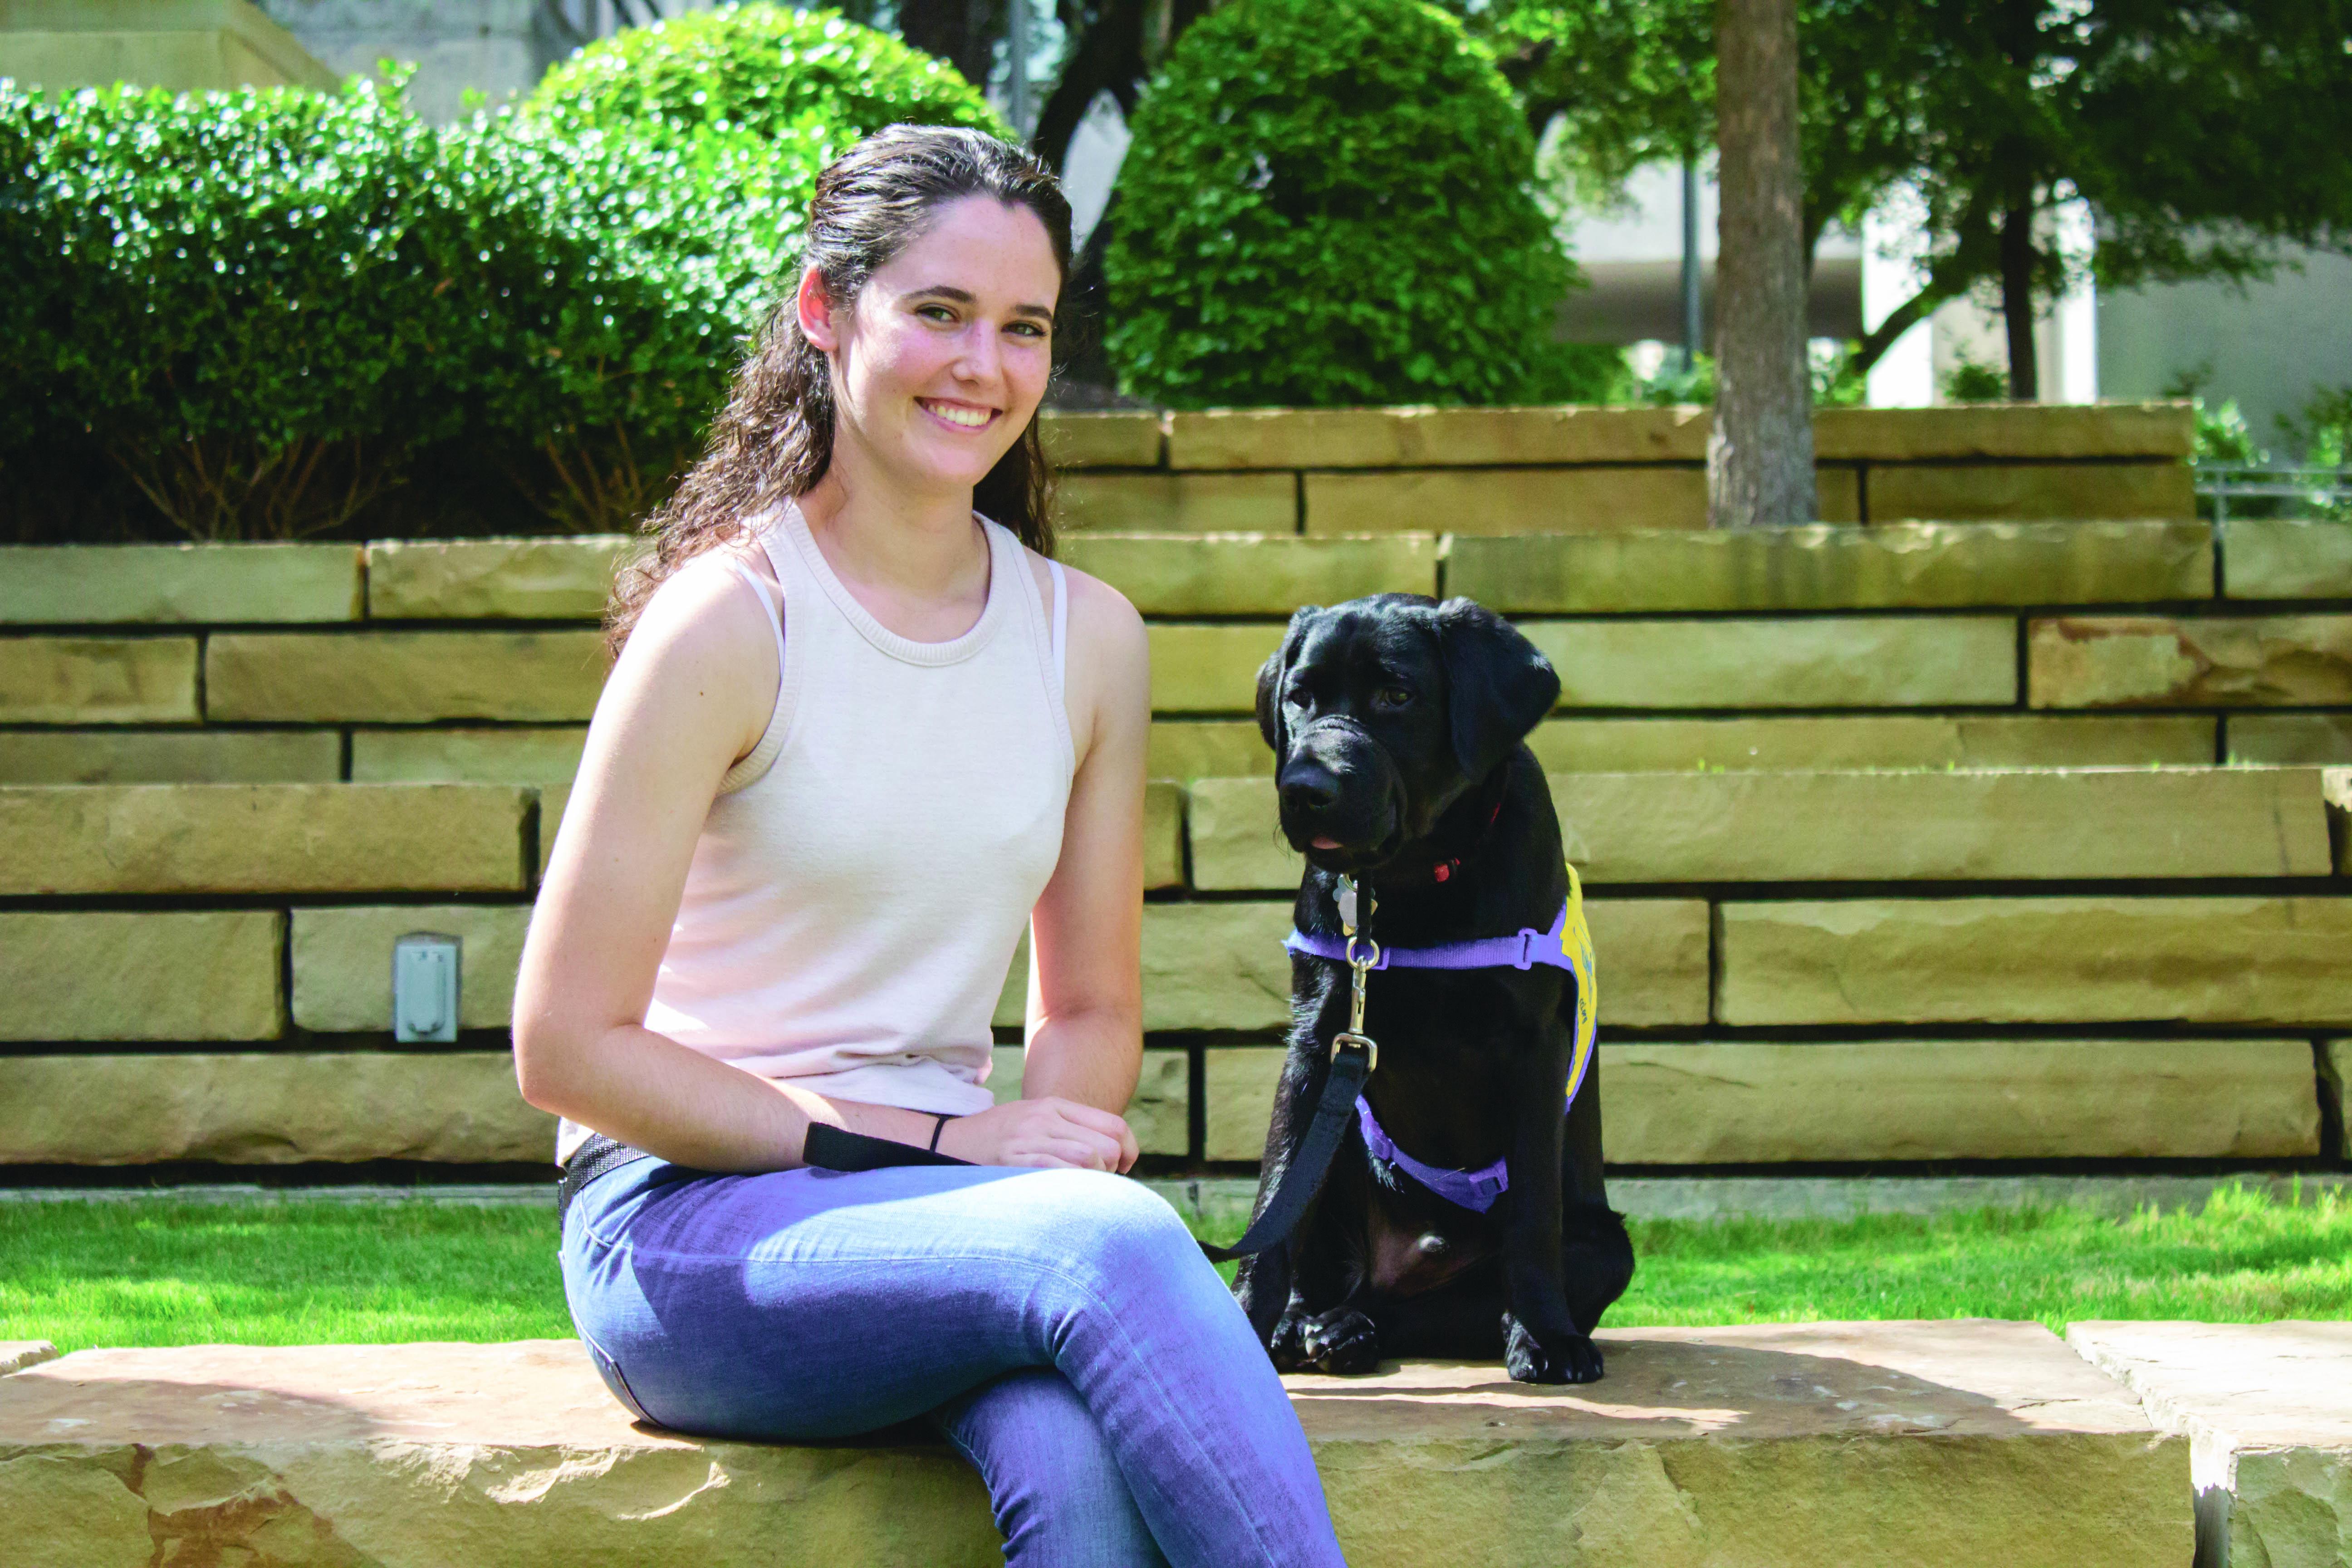 Group of Students Help Raise, Train Future Service Animals